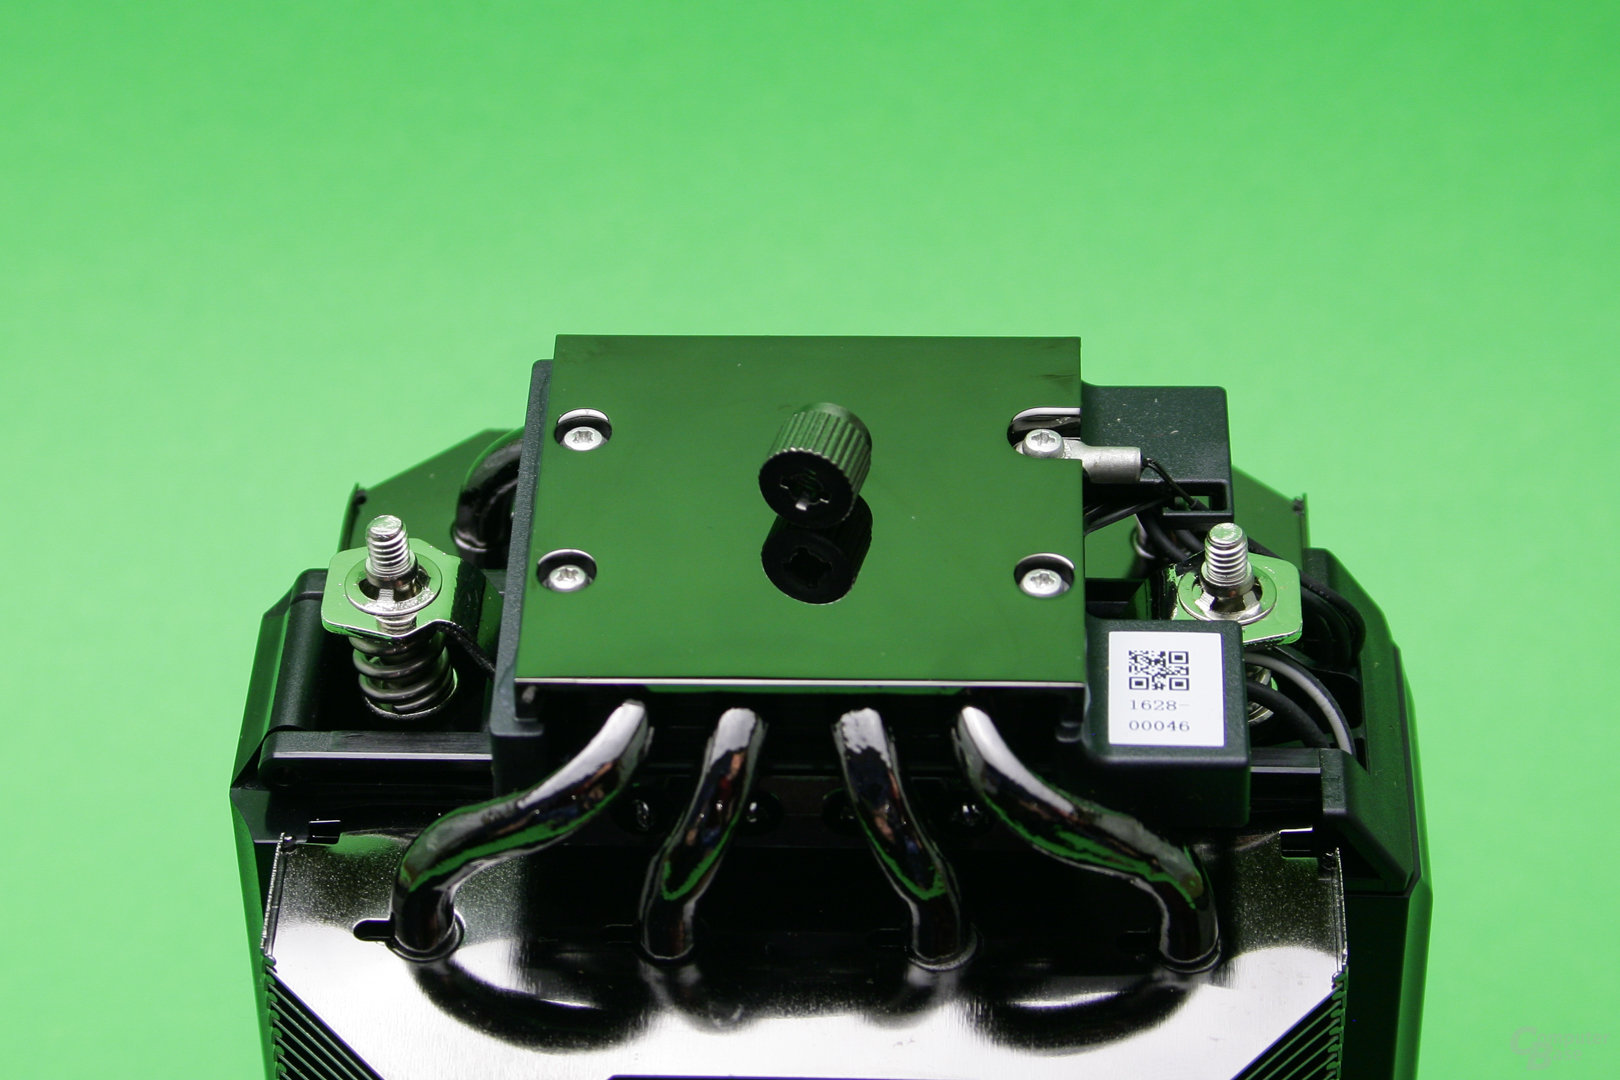 Phononic Hex 2.0: Bodenplatte